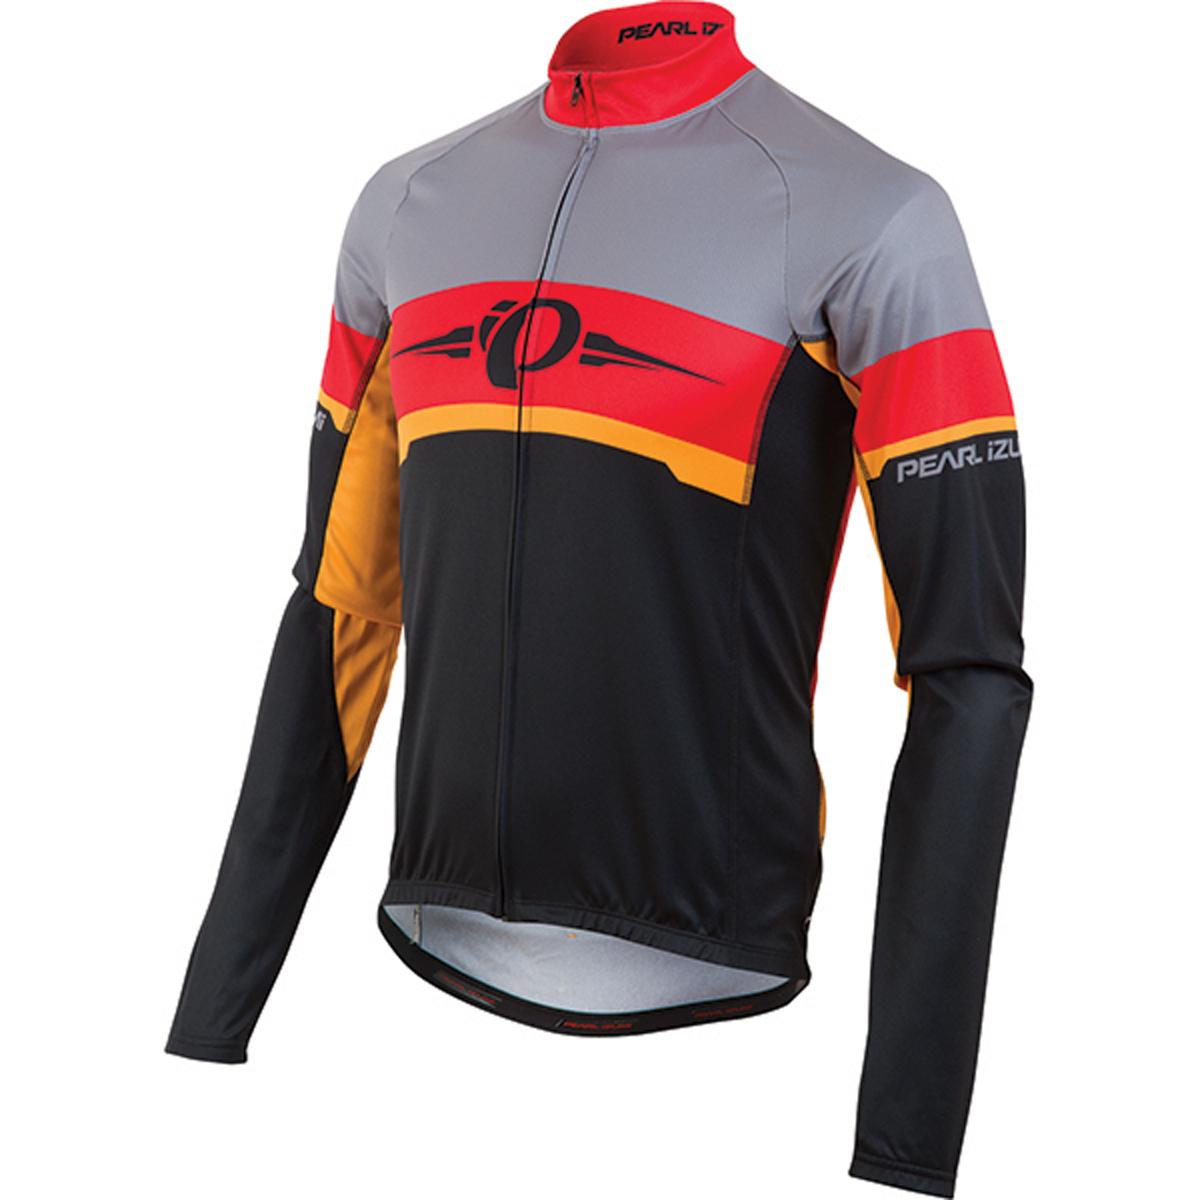 Pearl Izumi - Koszulka Thermal Elite LTD Kolor czerwony S